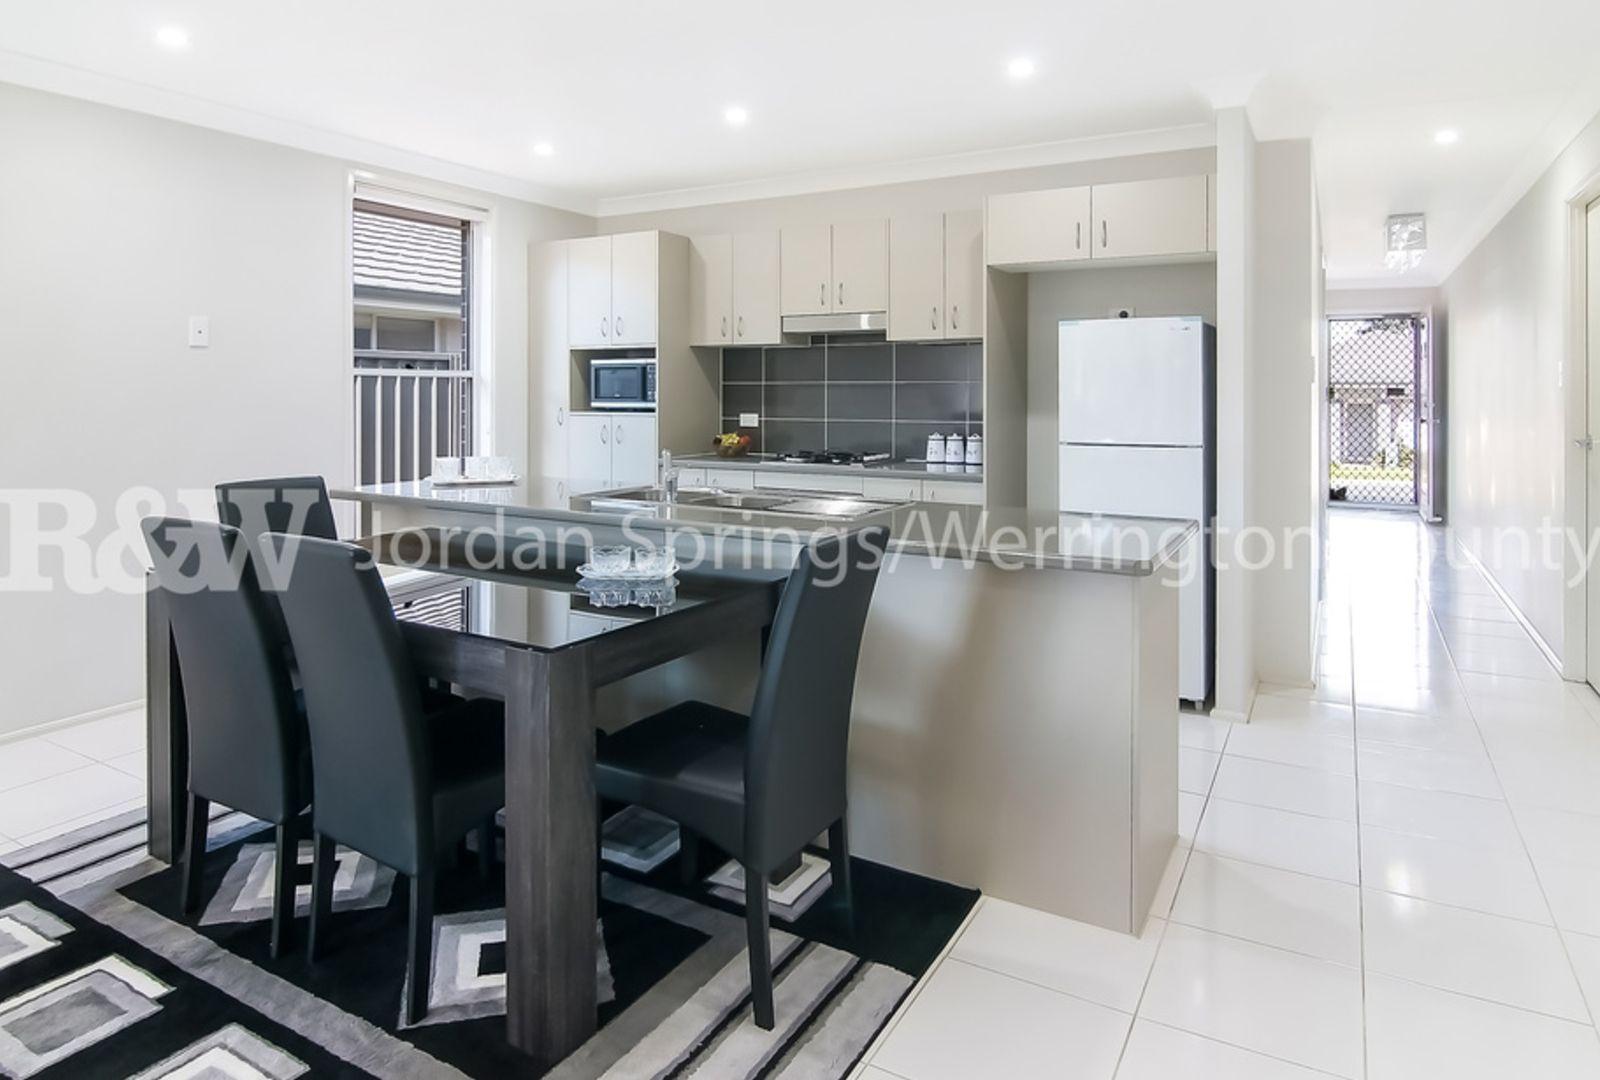 23 Fleet Avenue, Jordan Springs NSW 2747, Image 2